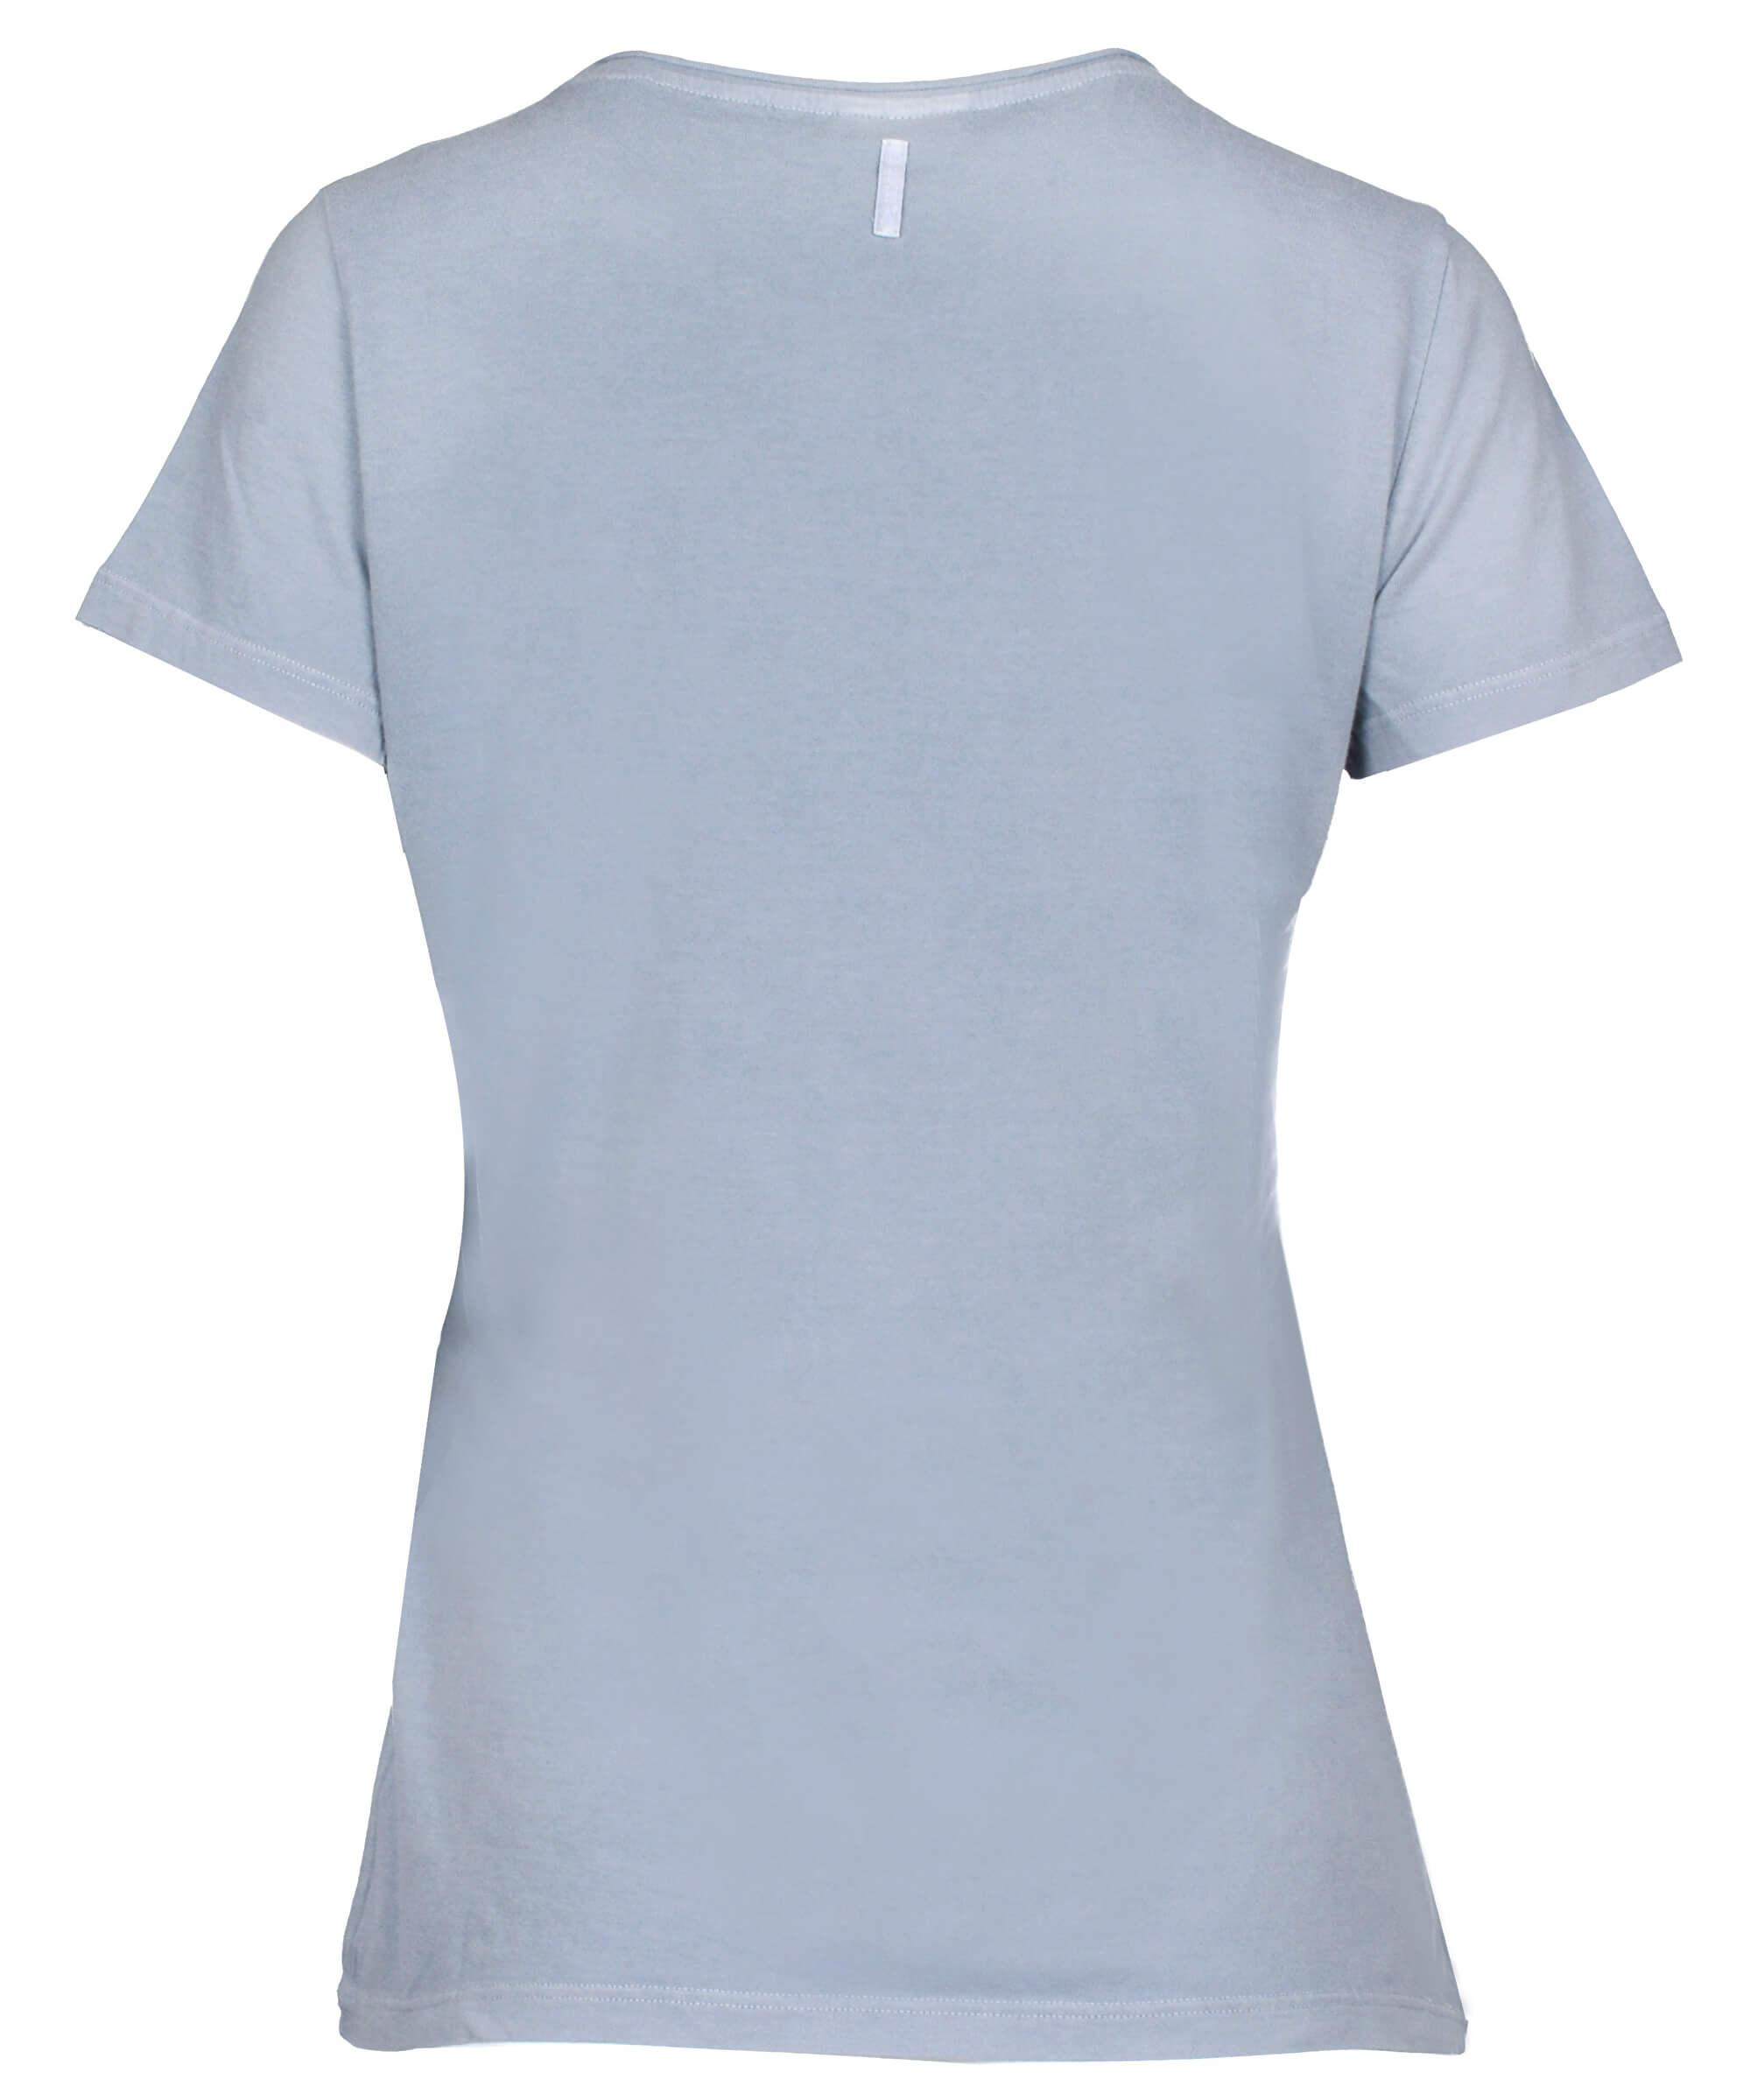 Deha Dámské triko T-Shirt B84150 Dusty Blue  a14cf20f73